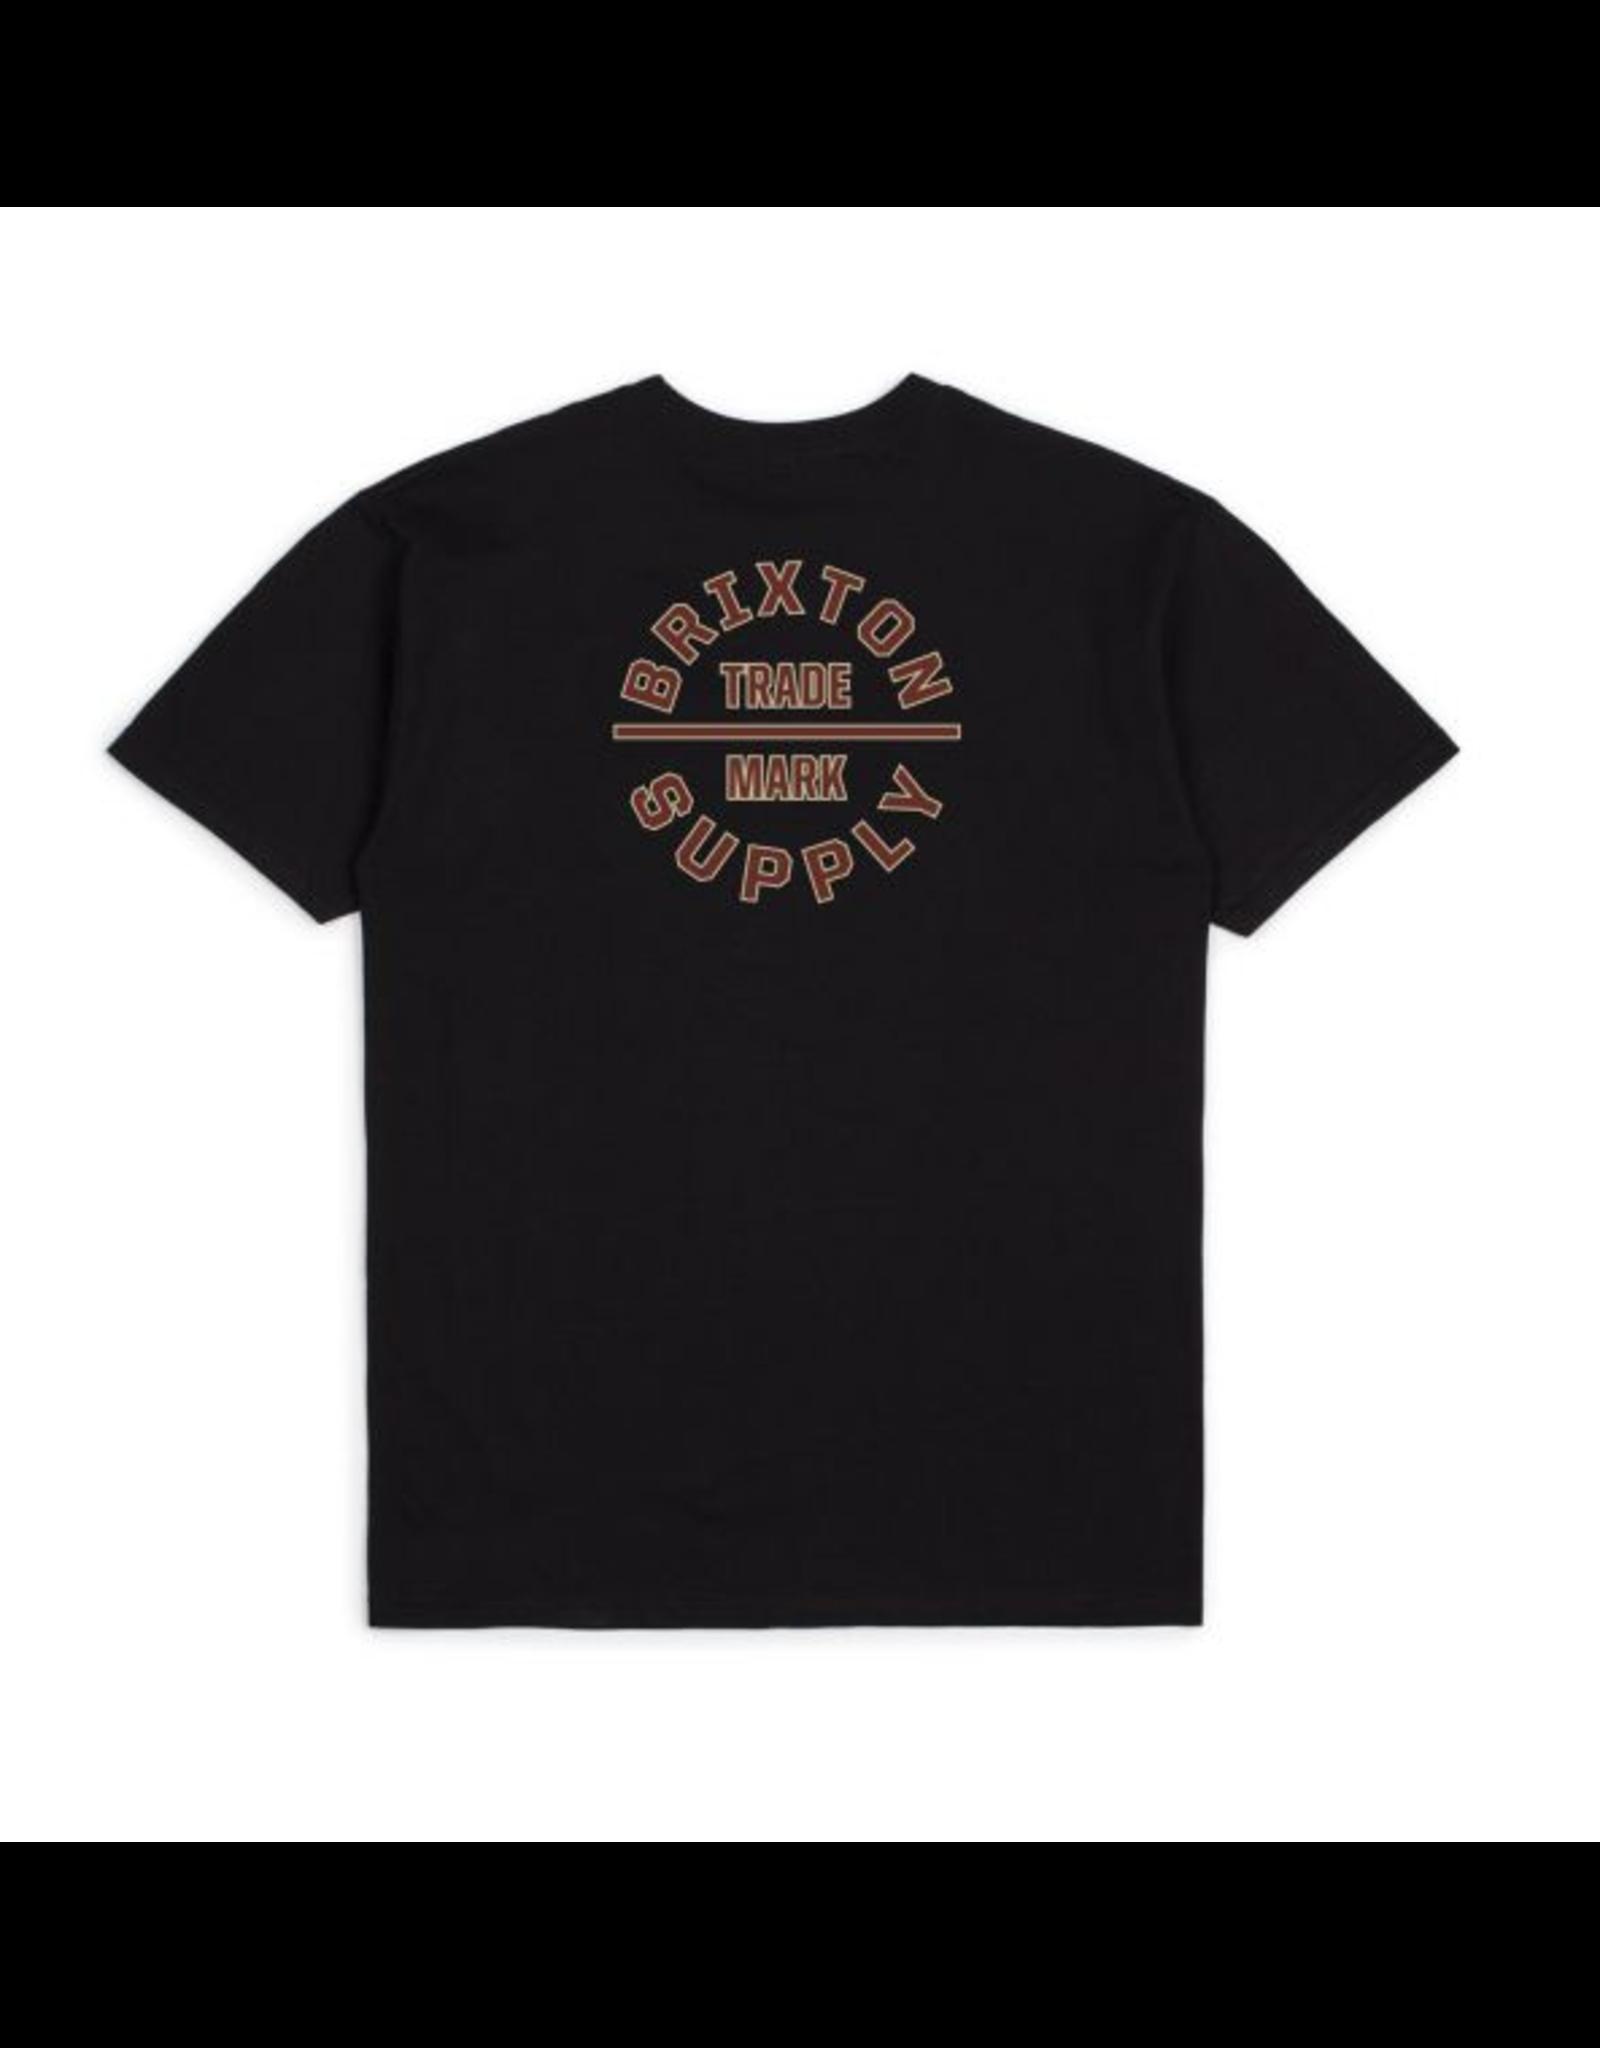 Brixton Oath V Standard Tee - Black/Dark Brick